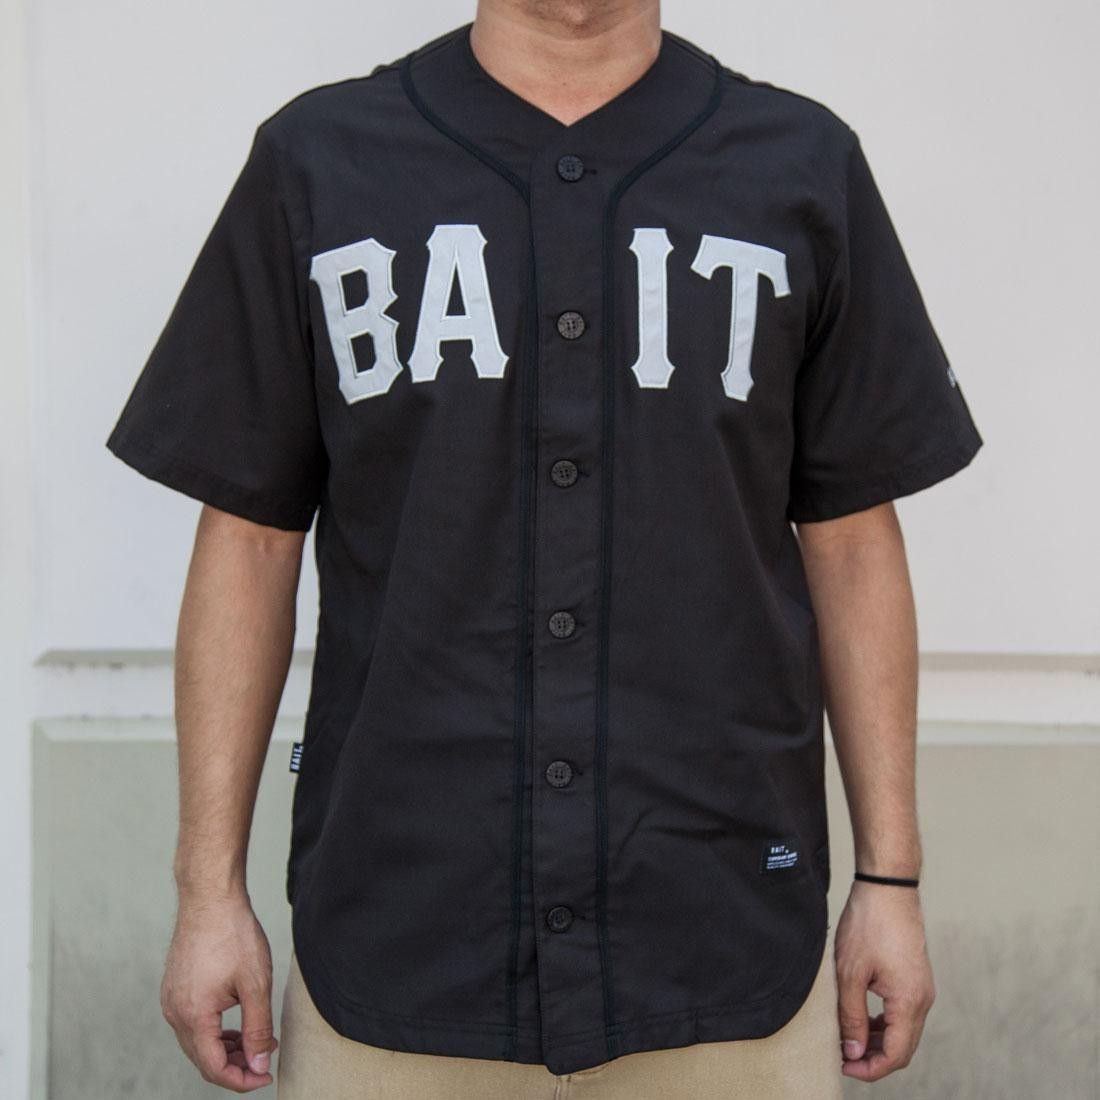 BAIT Men Sluggers Baseball Jersey (black / gray)